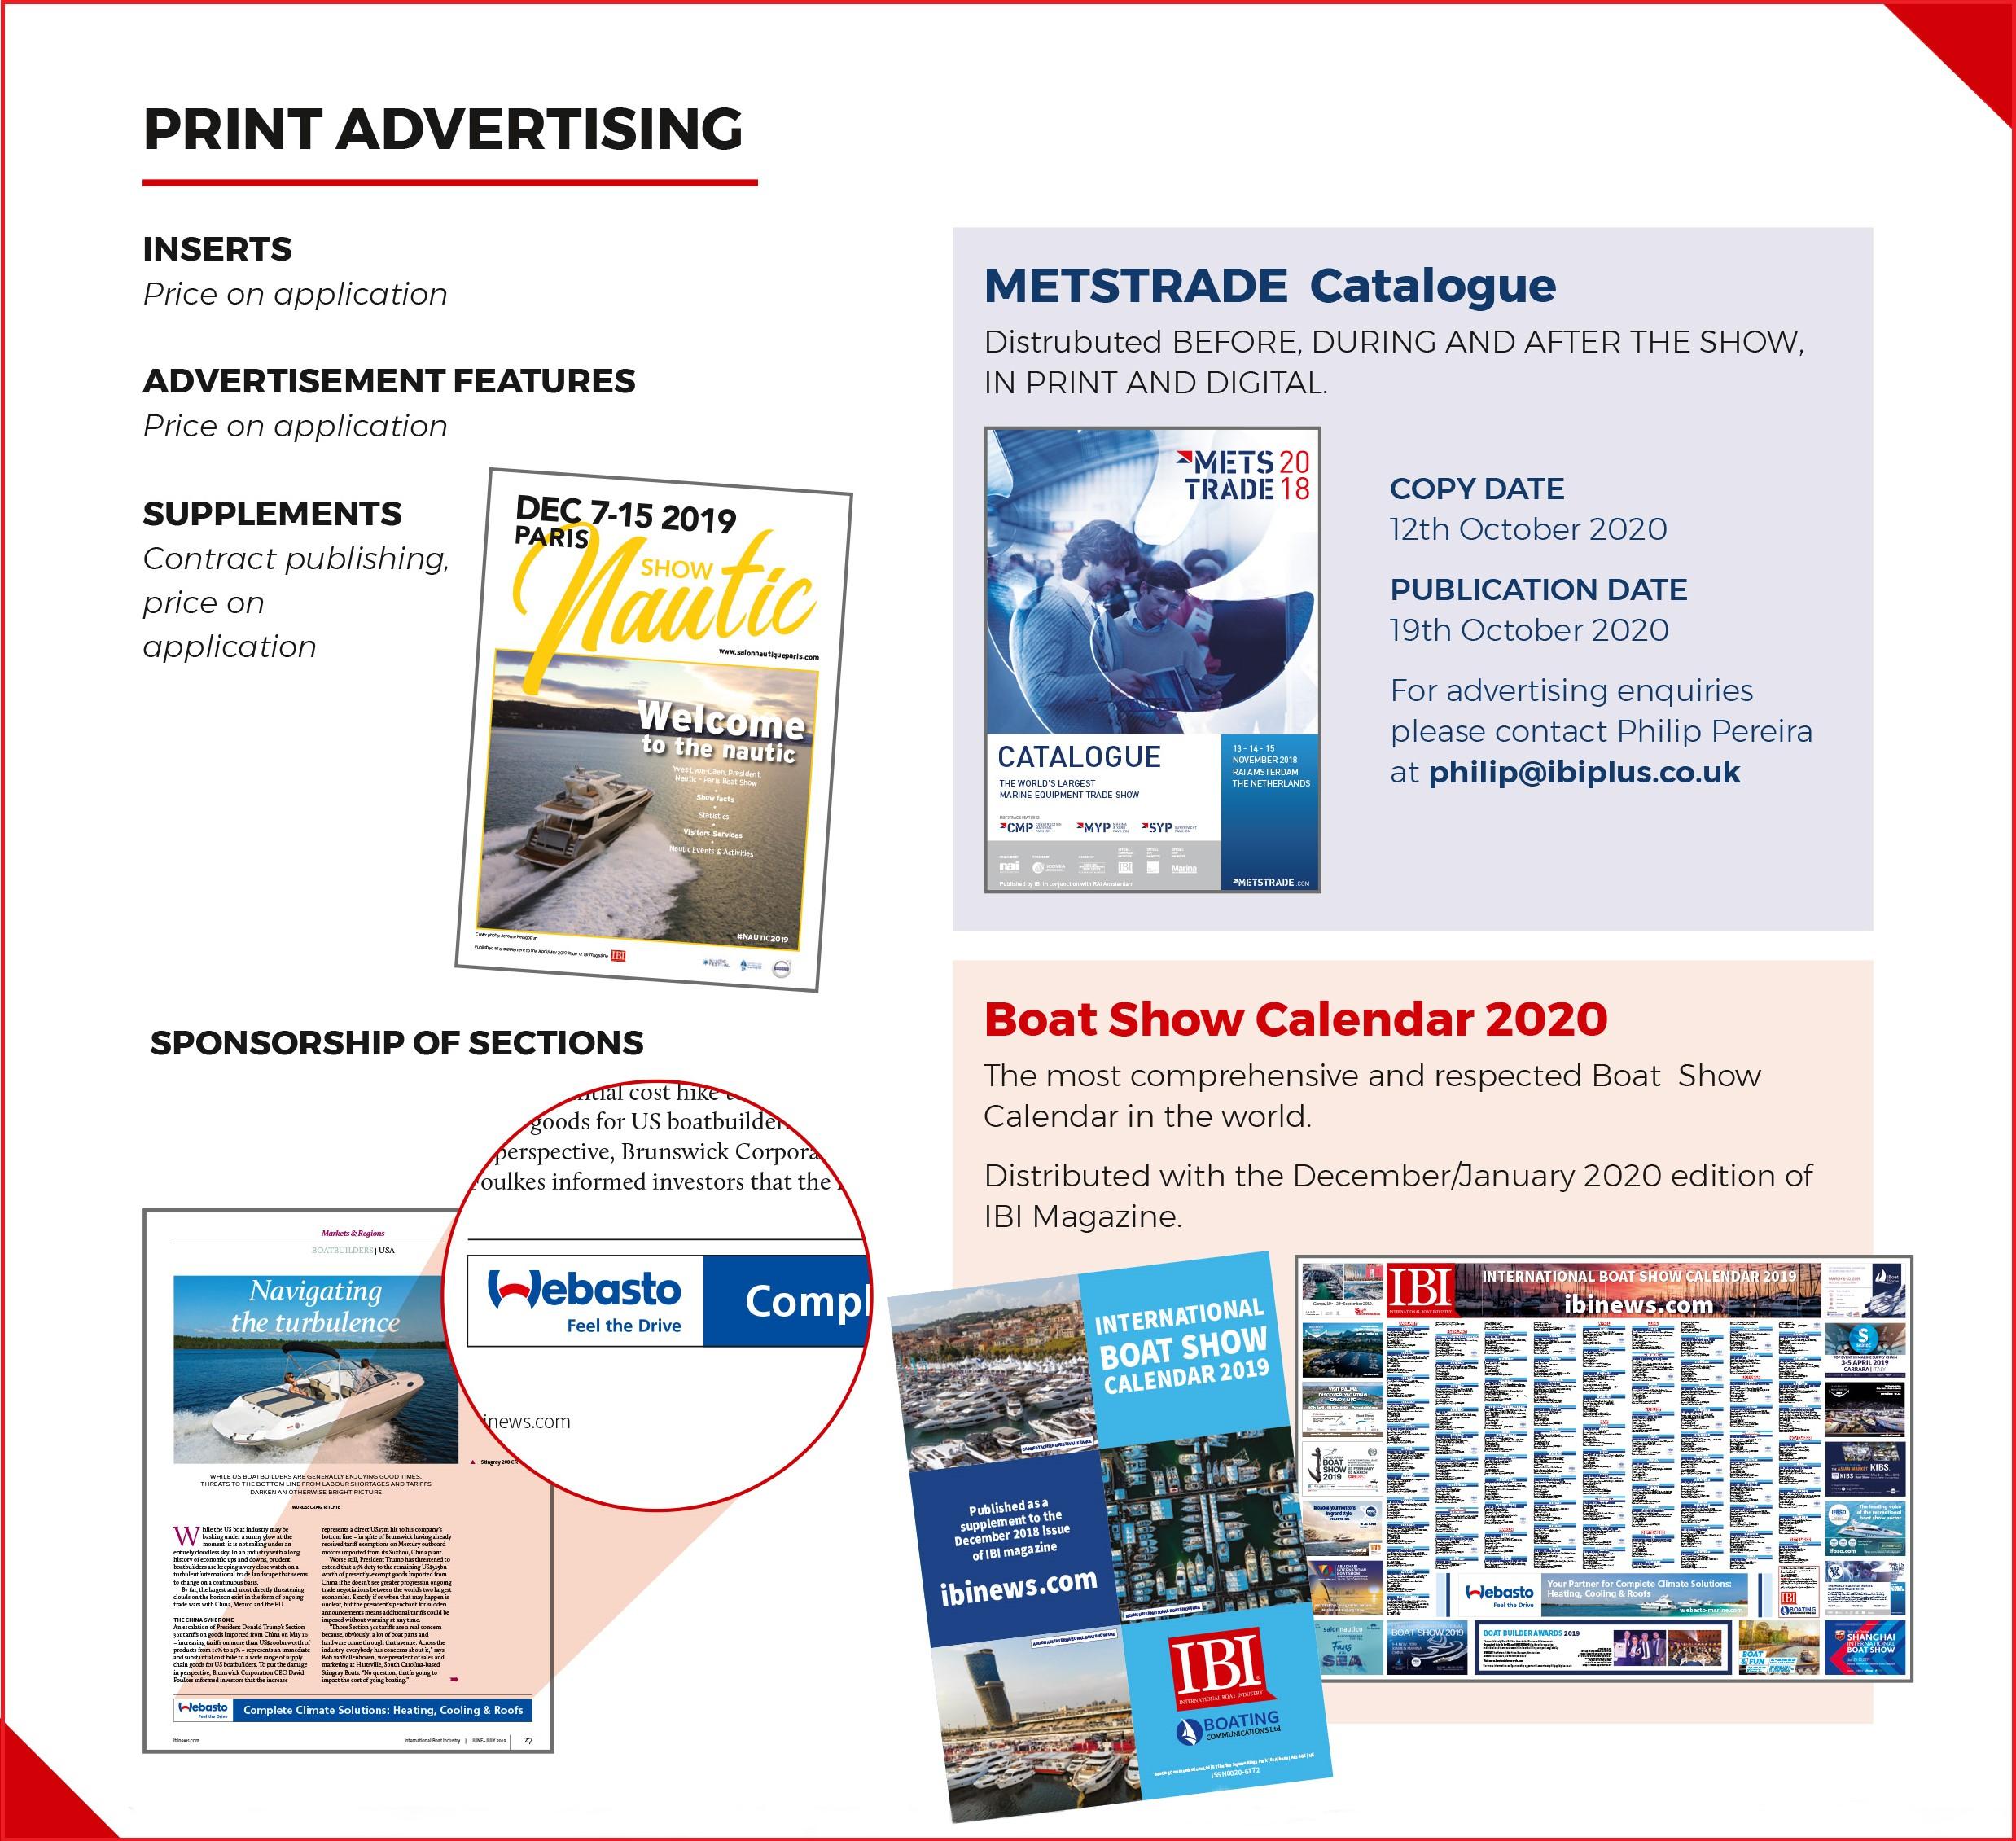 Print advertising opportunities